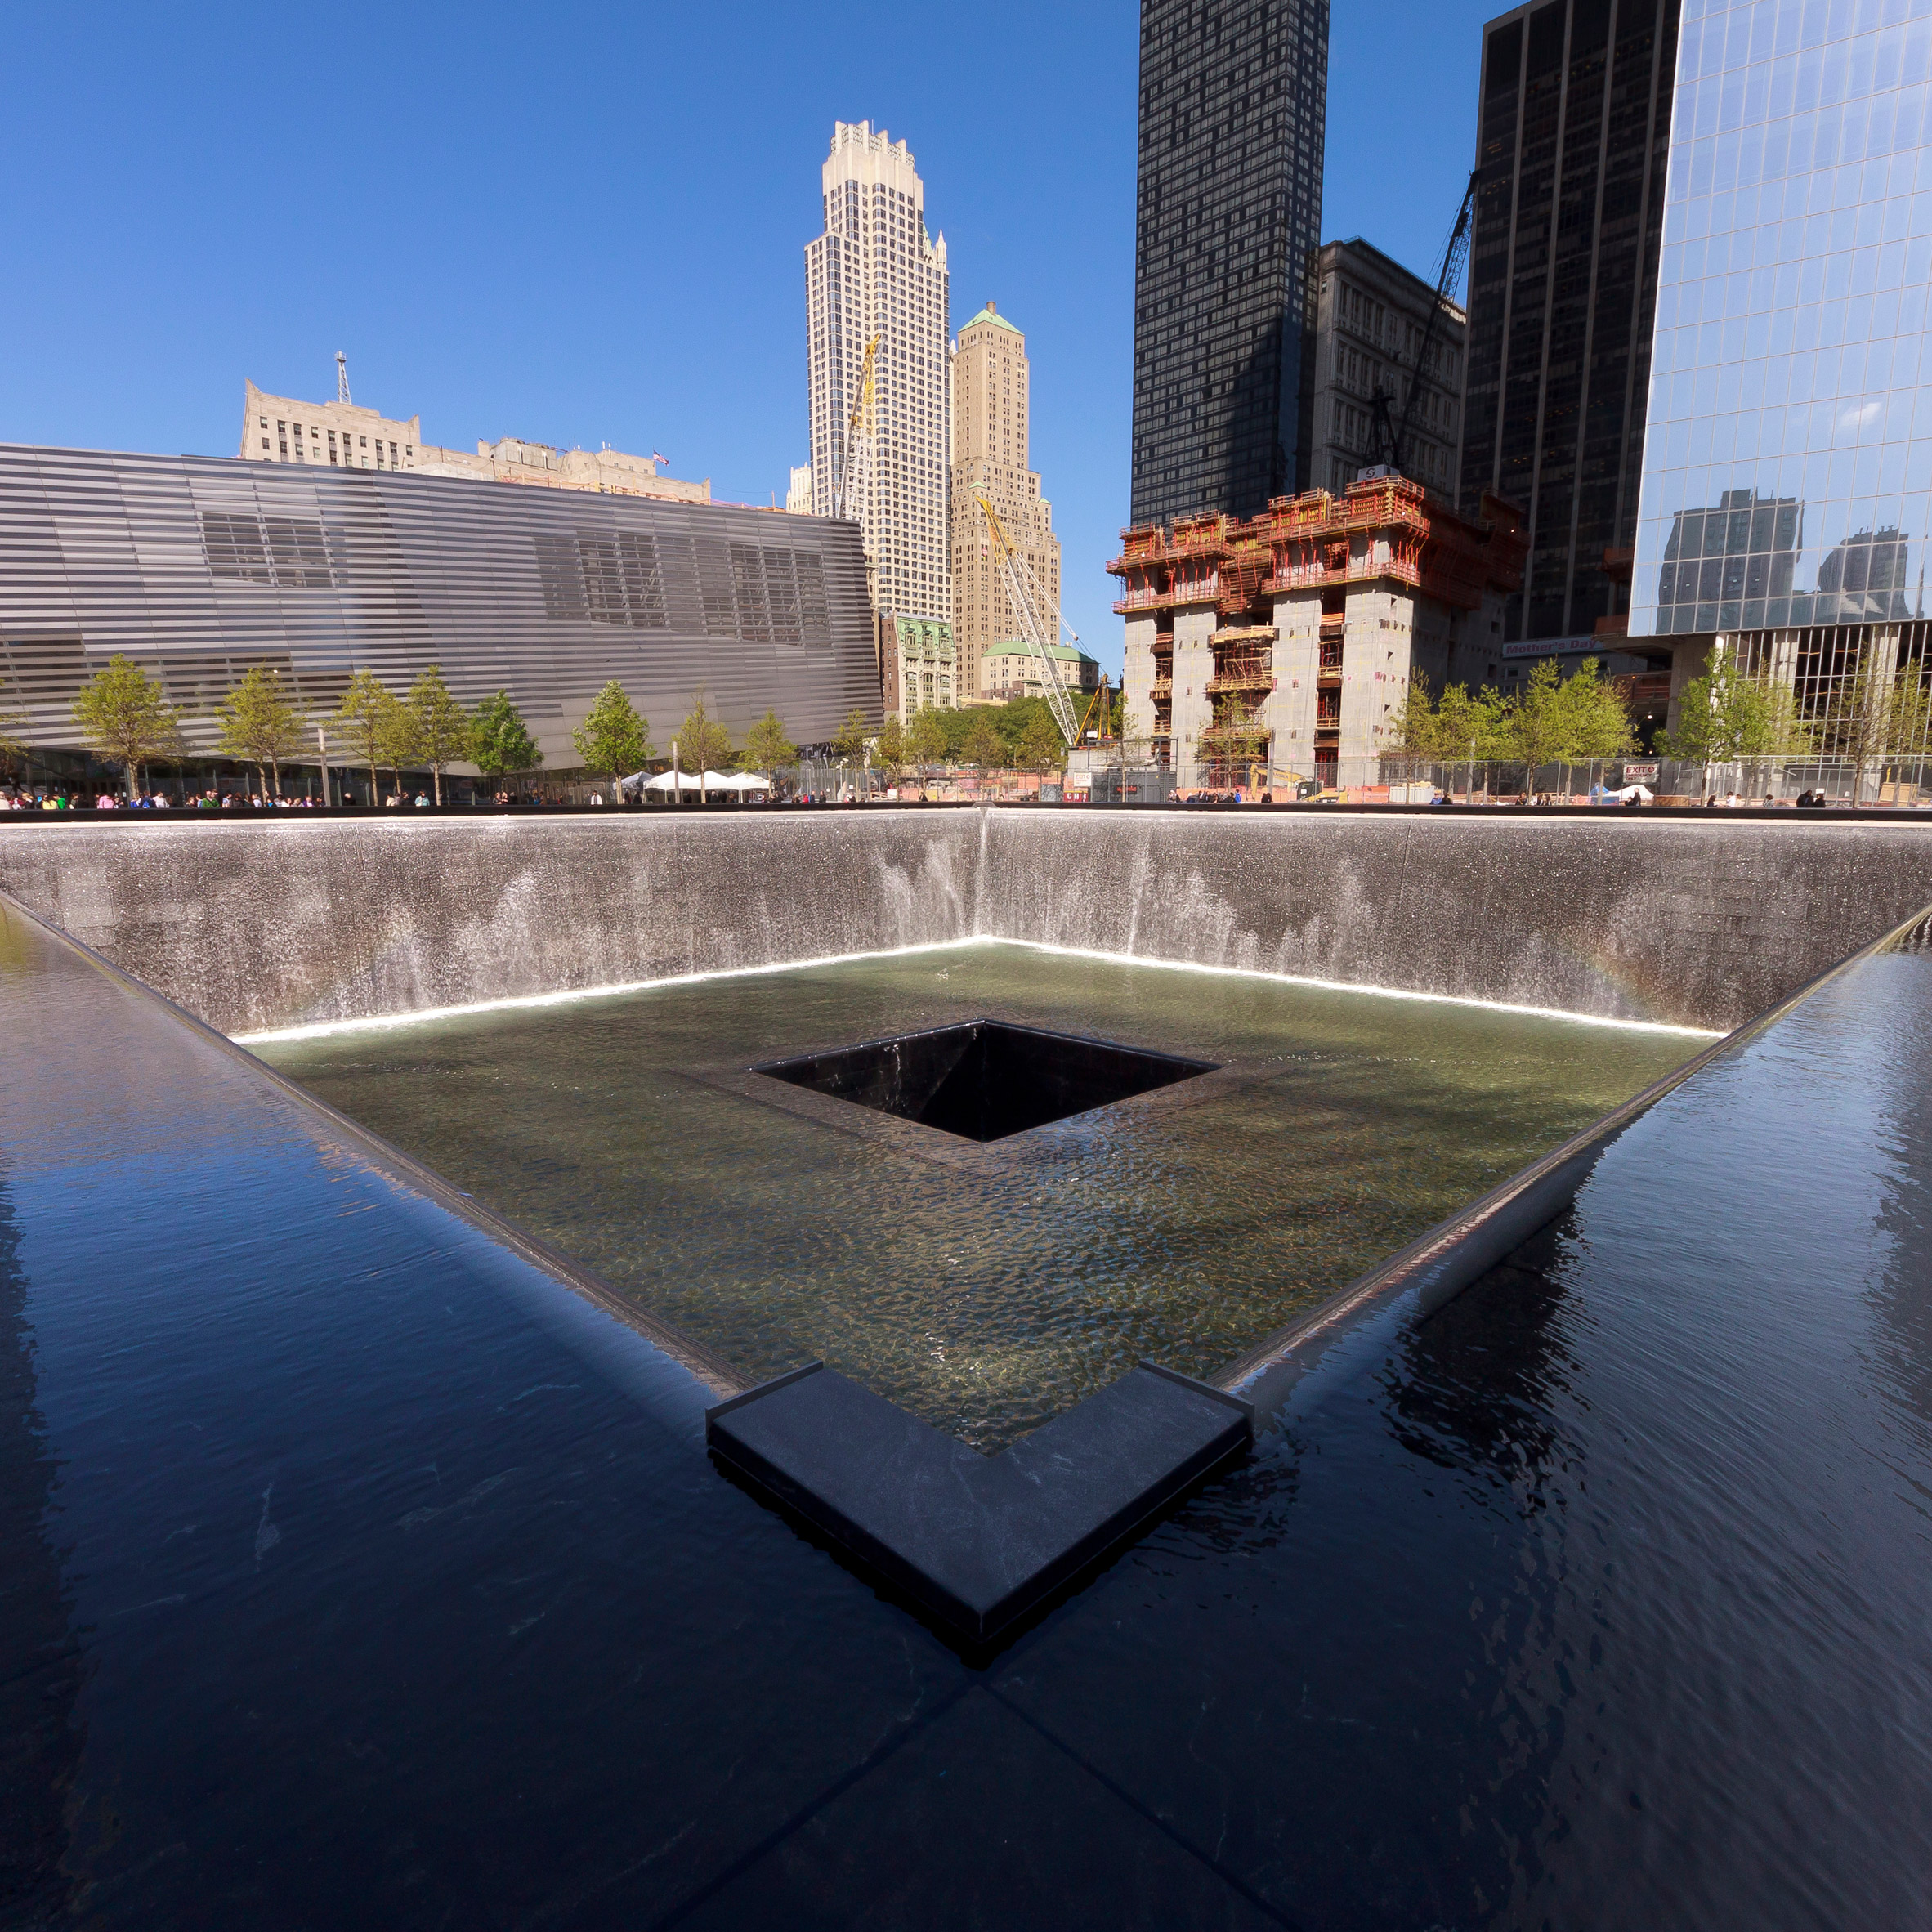 Waterfall architecture: 9/11 memorial